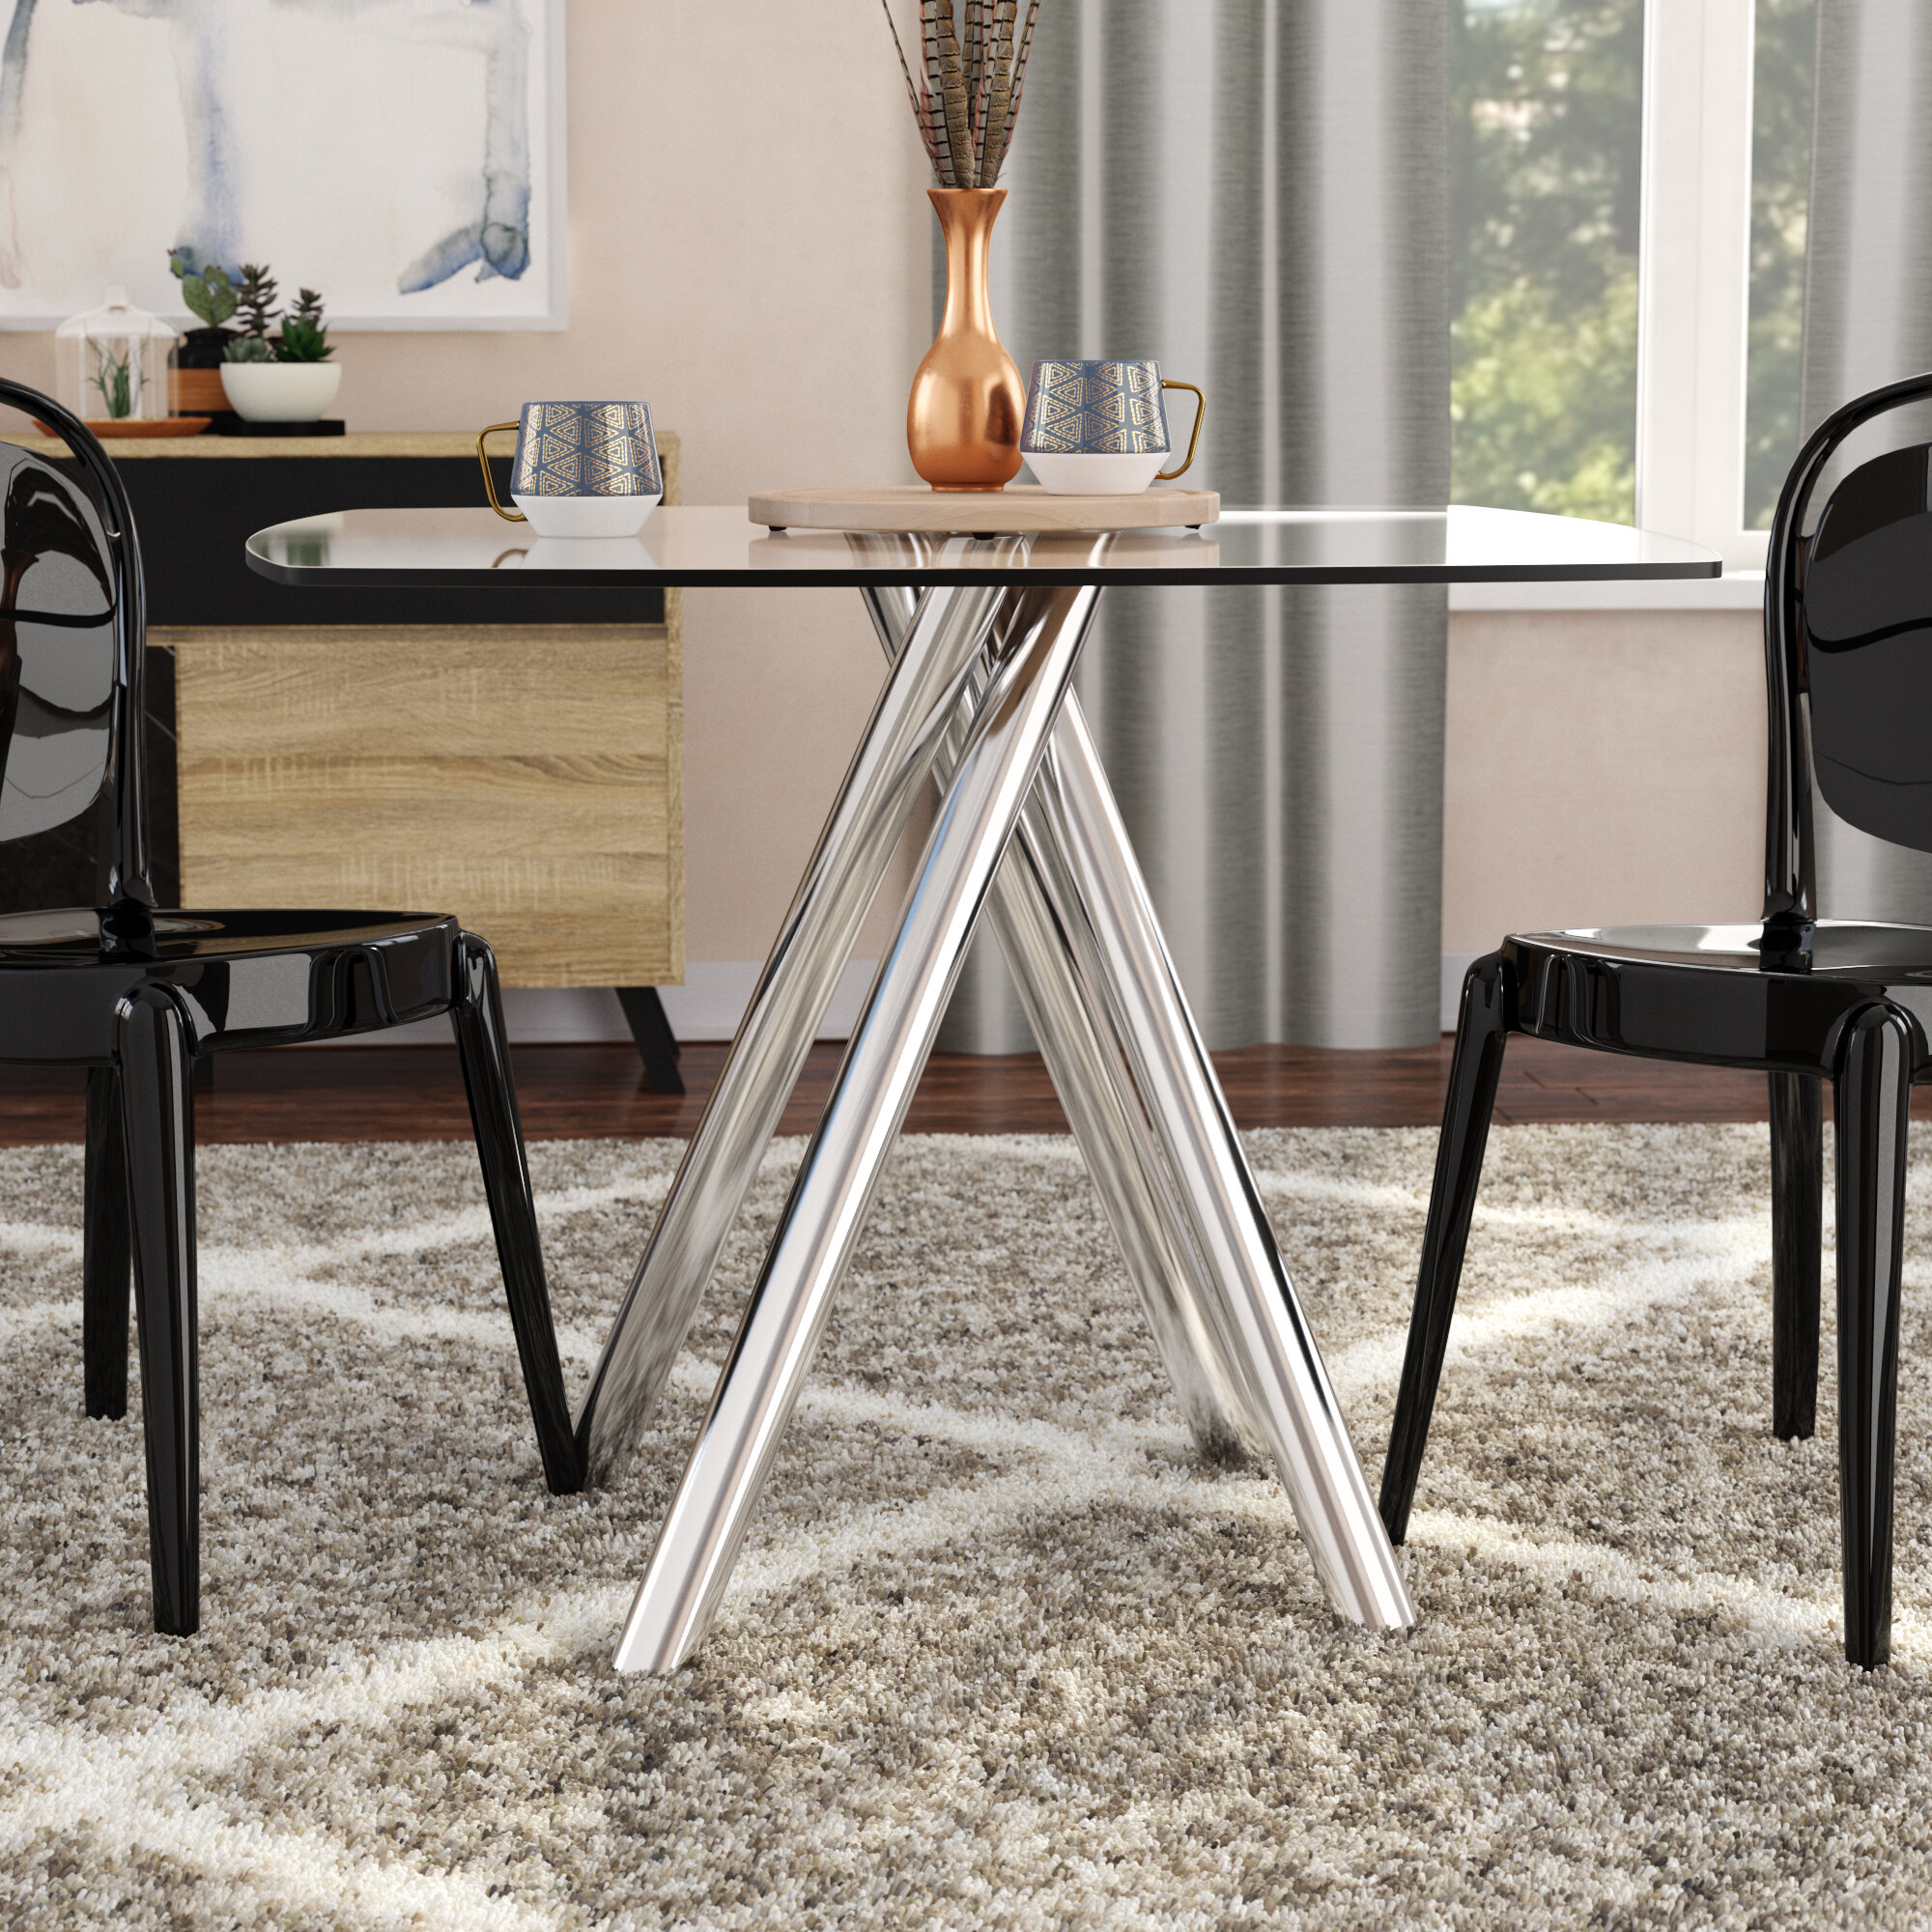 Pleasant Huebner Dining Table Download Free Architecture Designs Embacsunscenecom